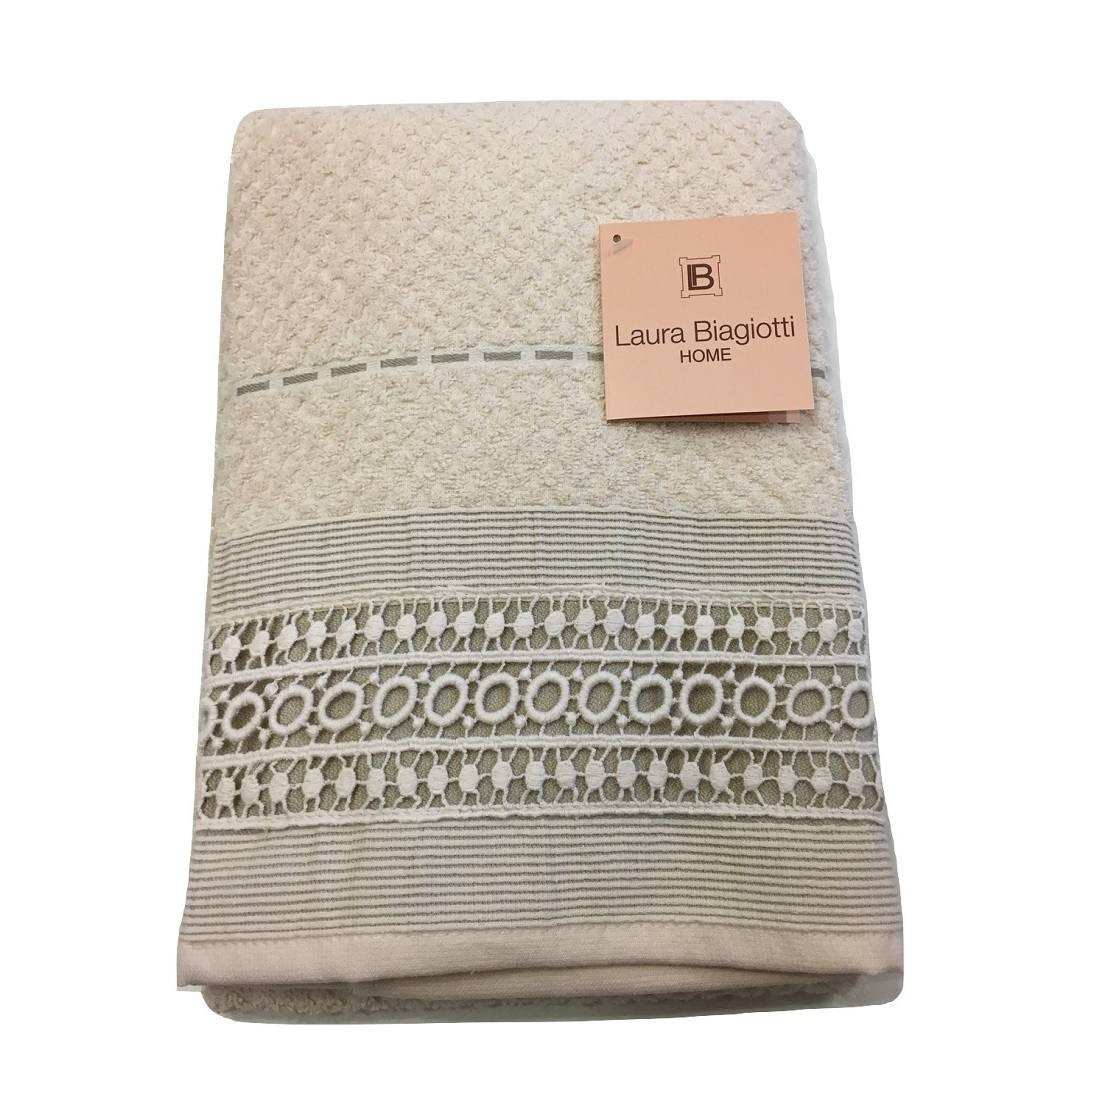 Laura Biagiotti Coppia asciugamani di spugna Augusta-Beige